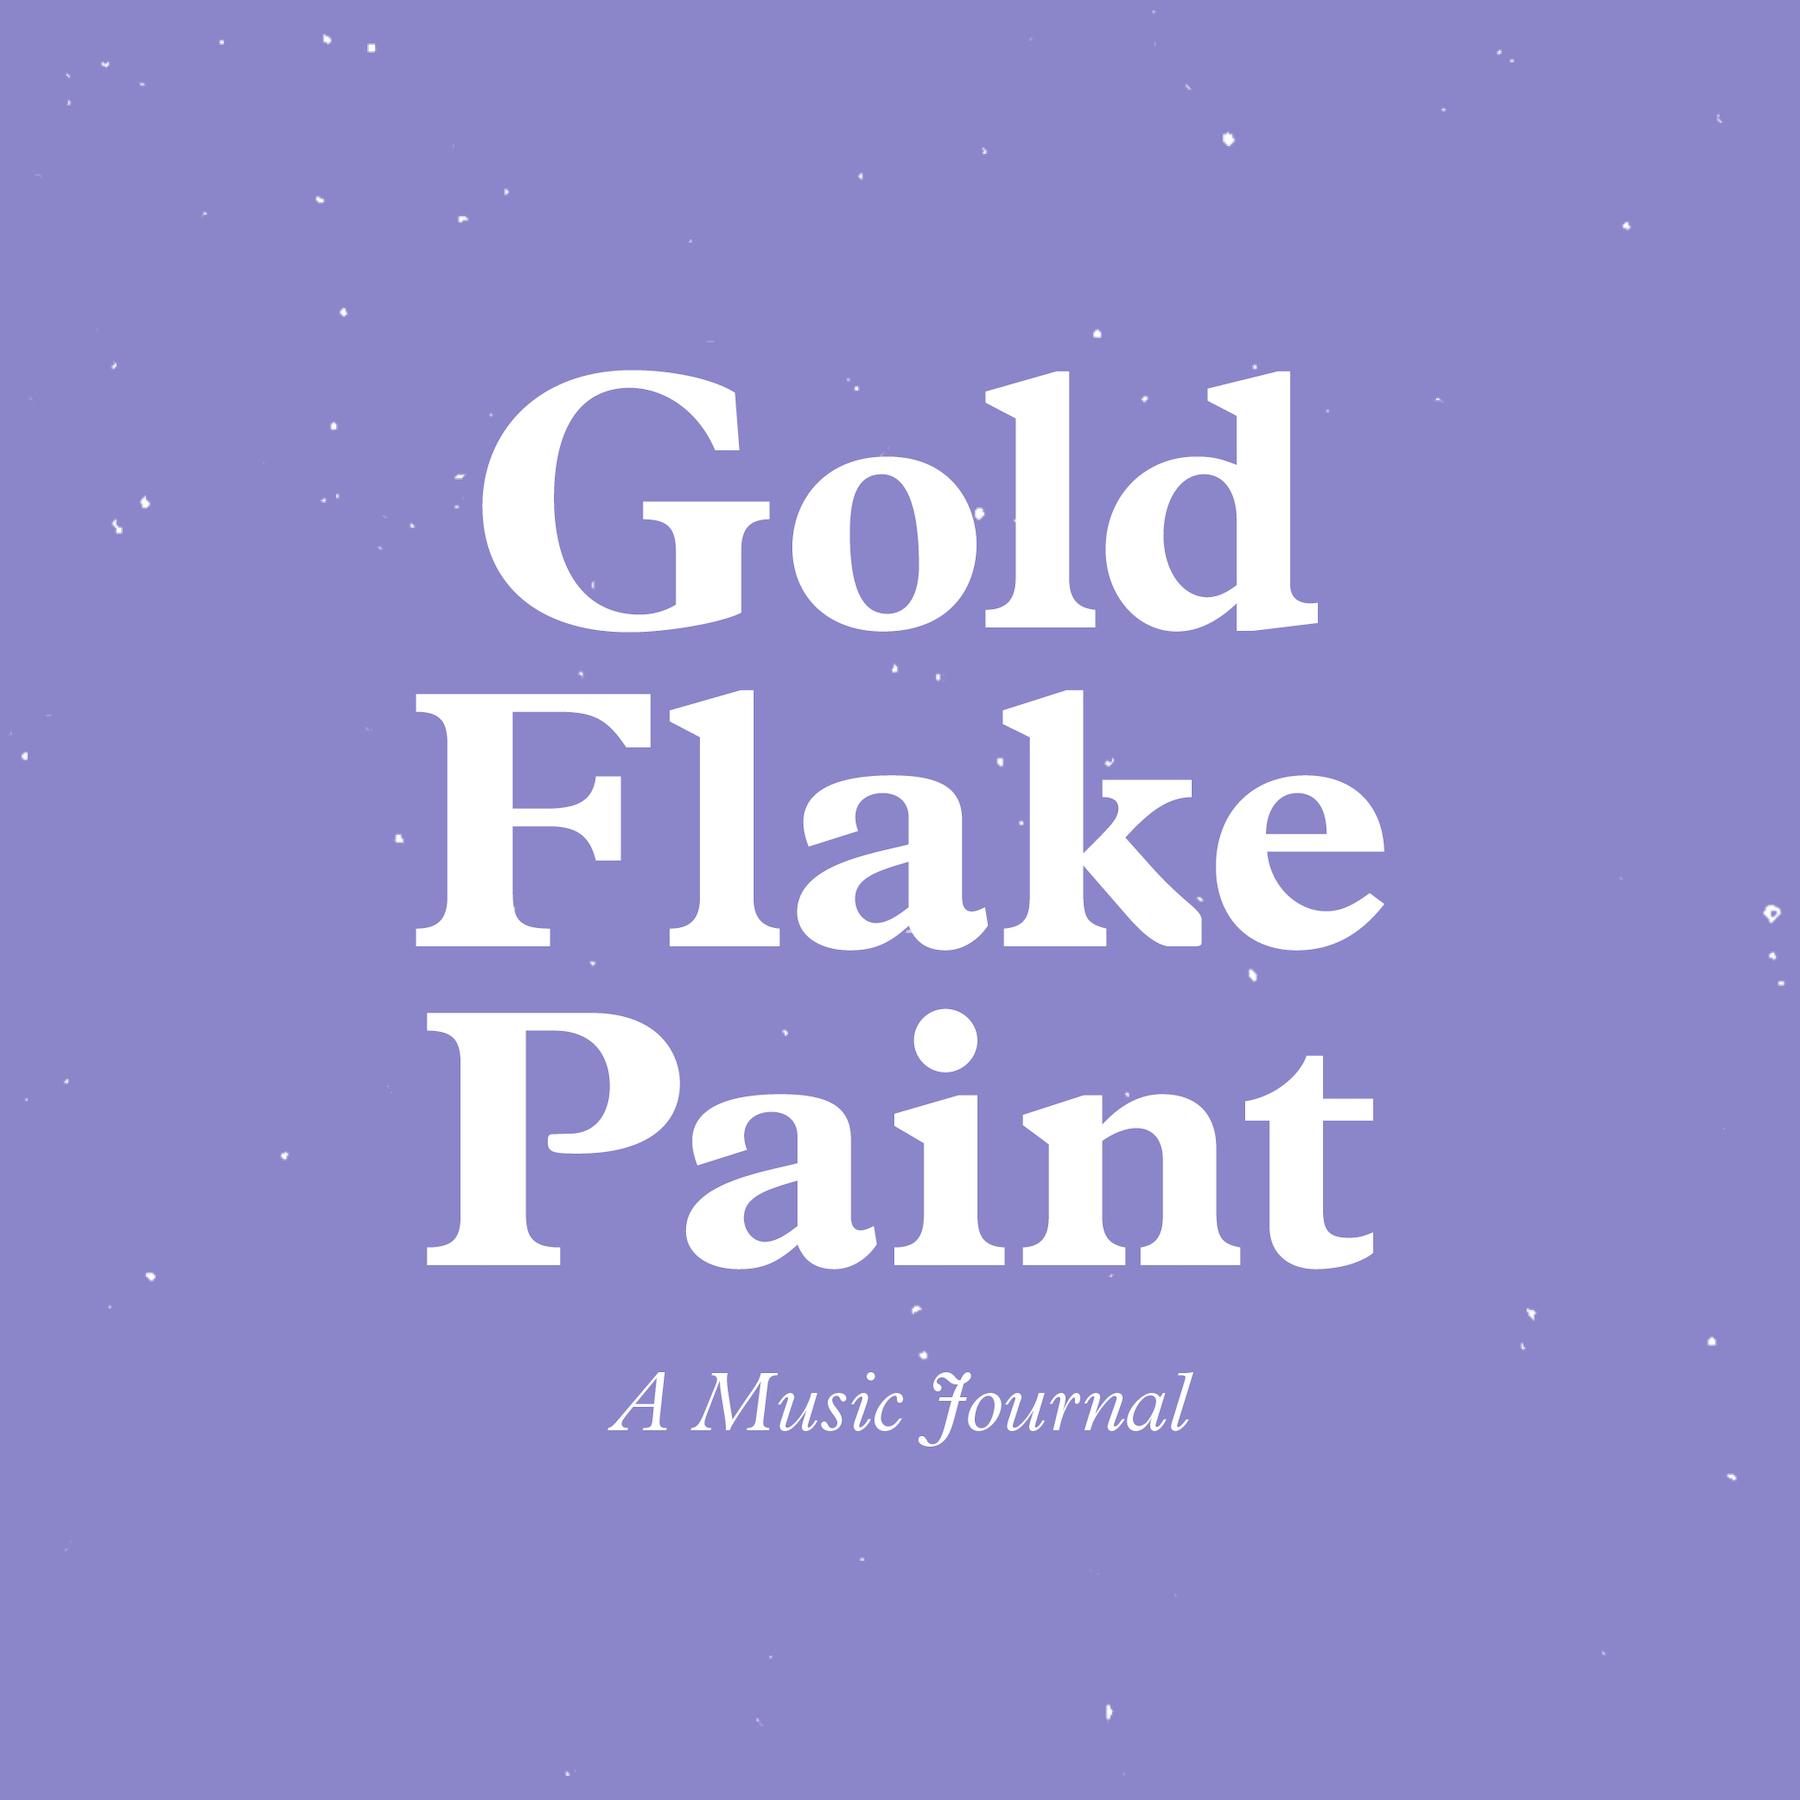 Gold Flake Paint